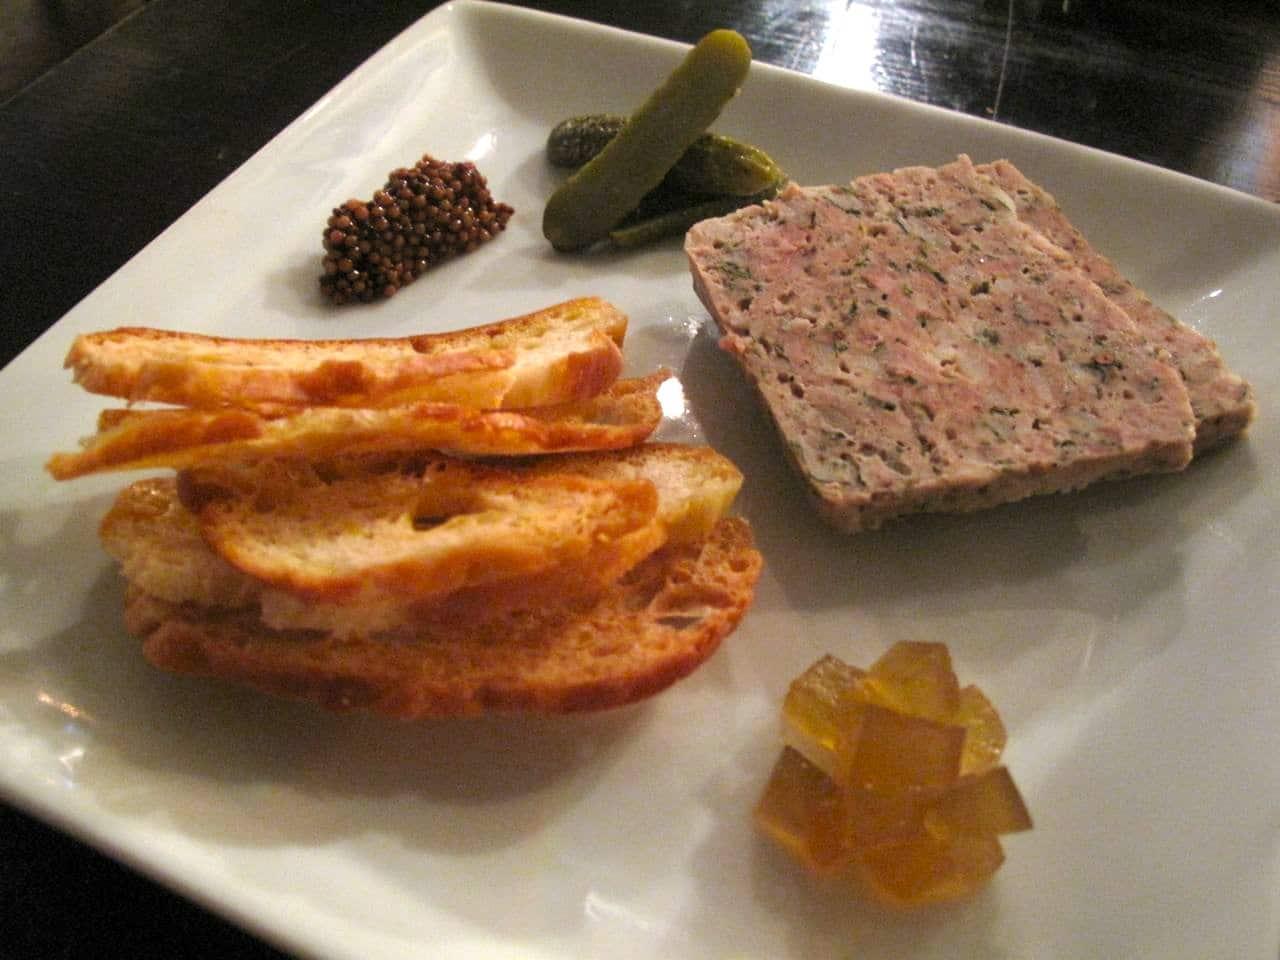 Pork Terrine with pickled watermelon rind at Beast Restaurant Toronto.